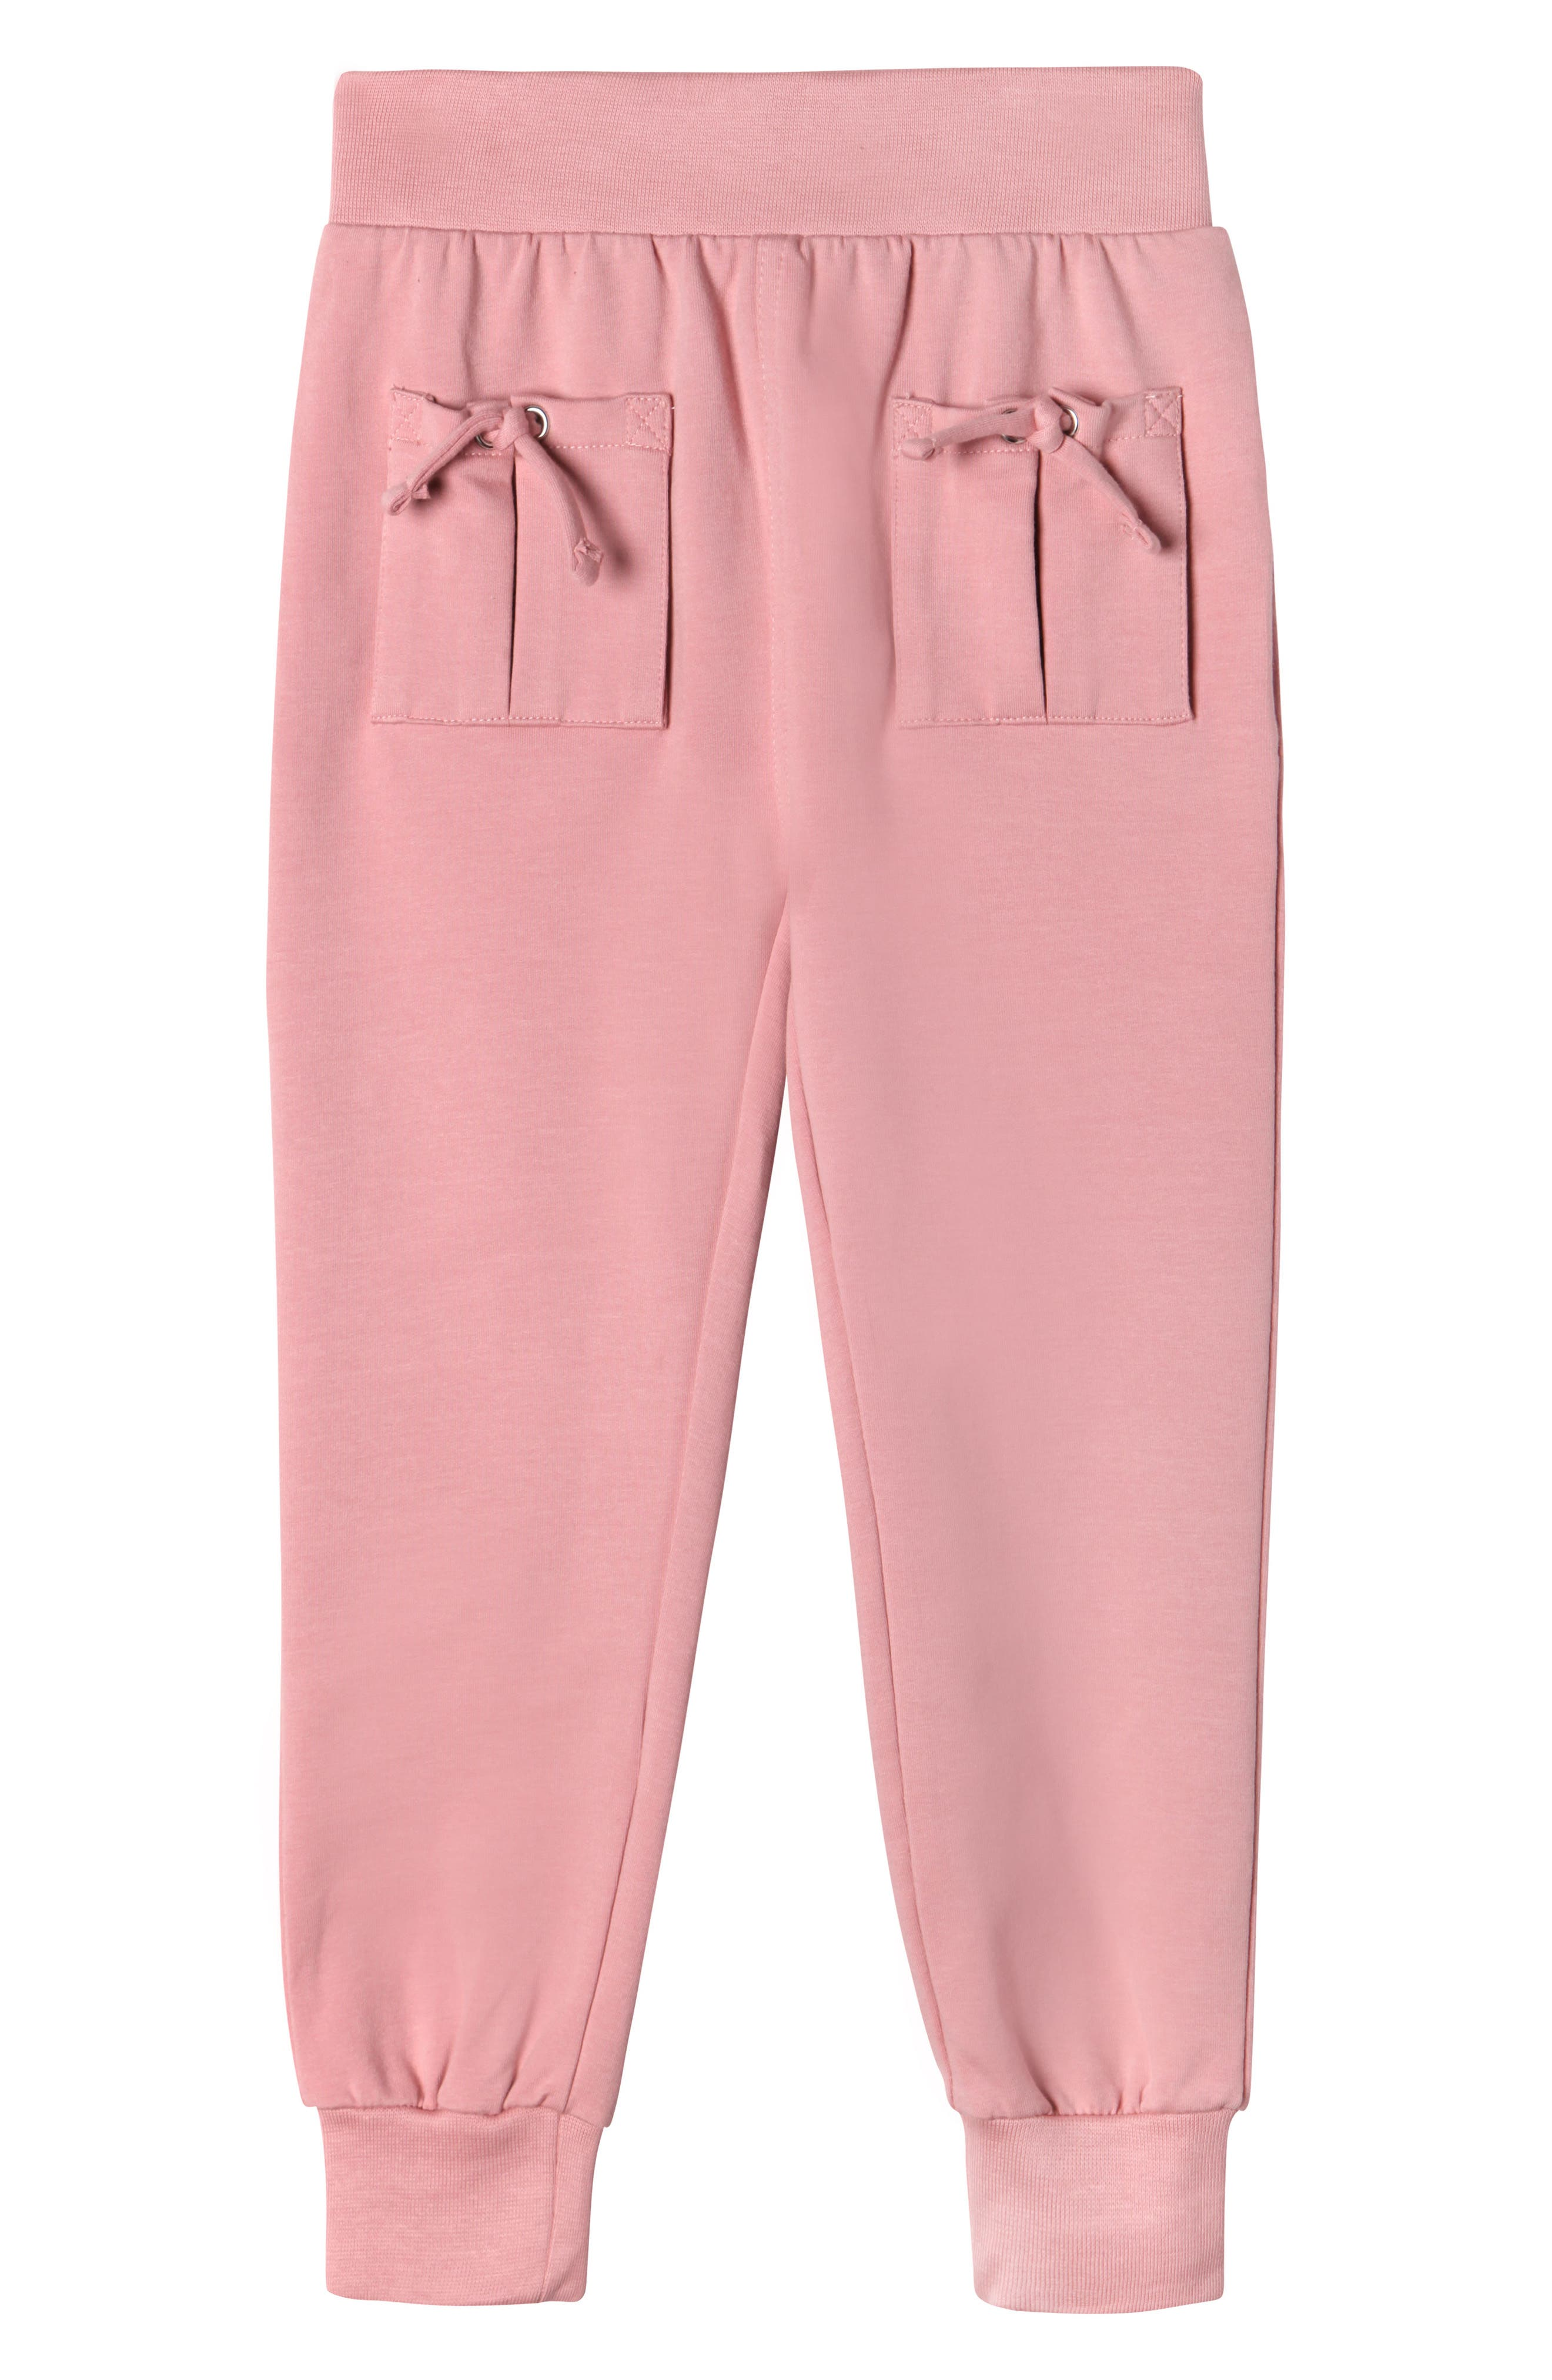 Main Image - Art & Eden Aubrey Tie Pocket Sweatpants (Toddler Girls & Little Girls)